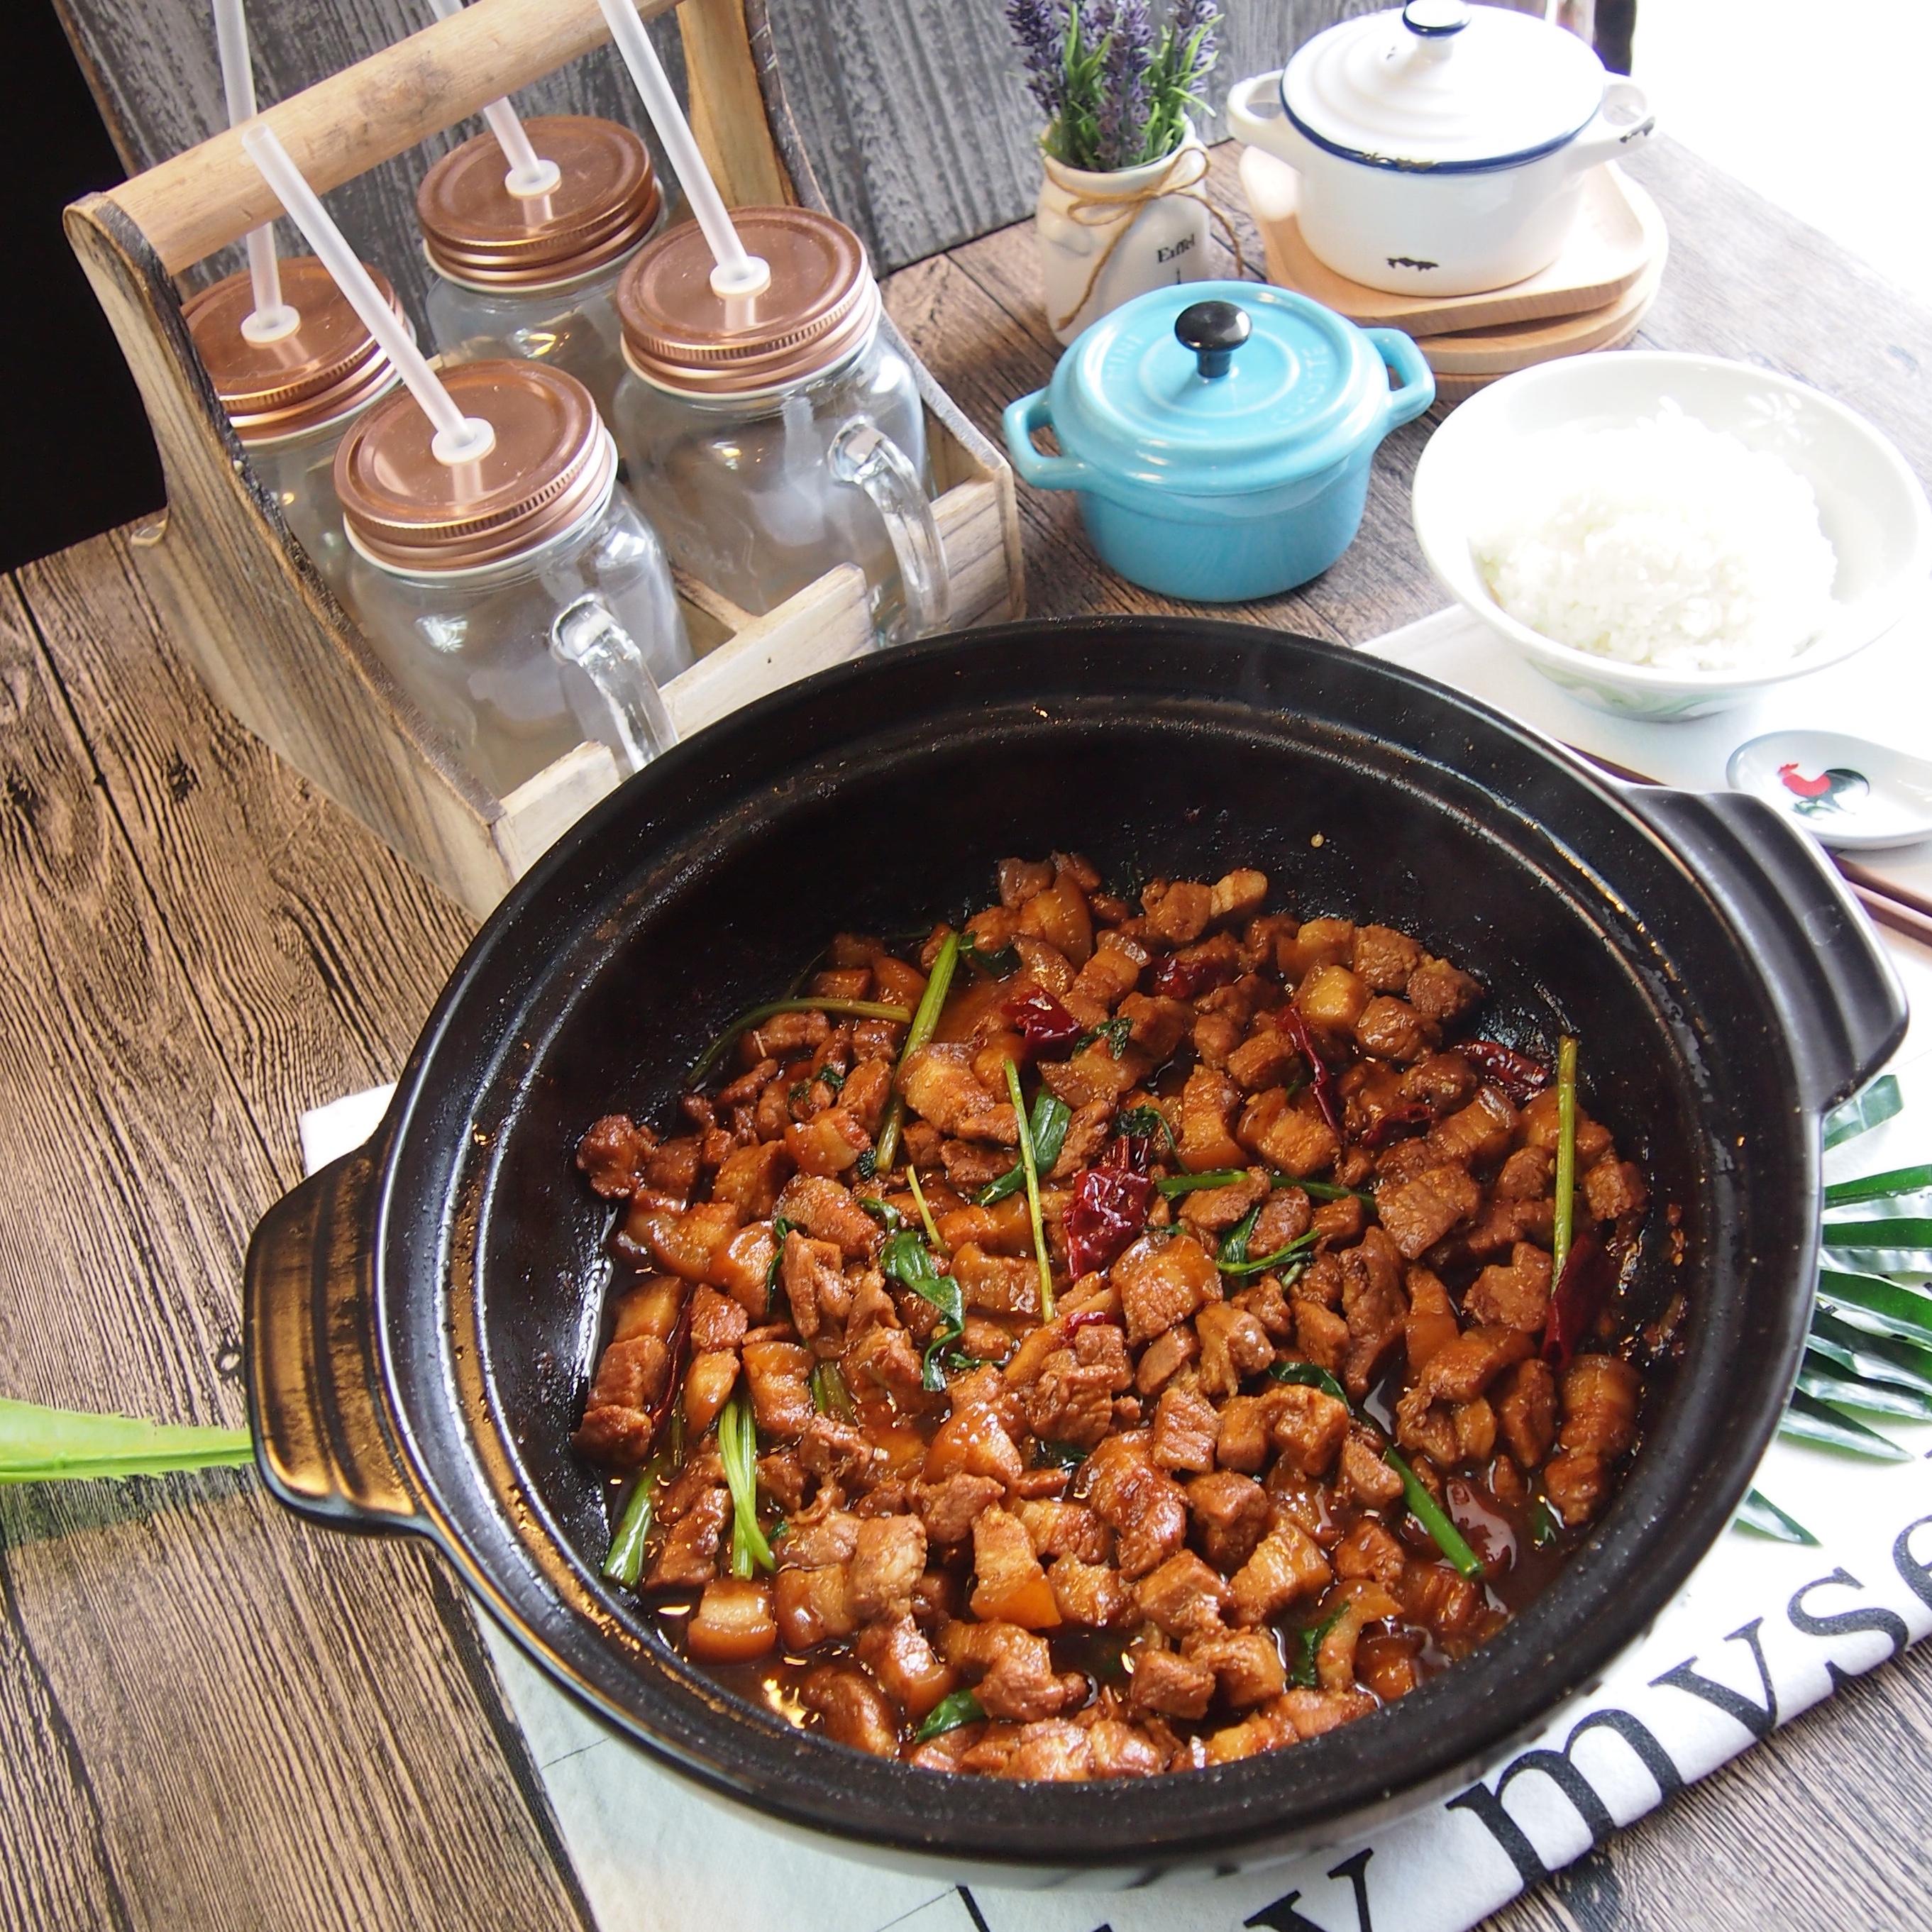 Super Good Chinese Recipe: Claypot Salted Fish w/ Pork Belly 咸鱼花腩煲